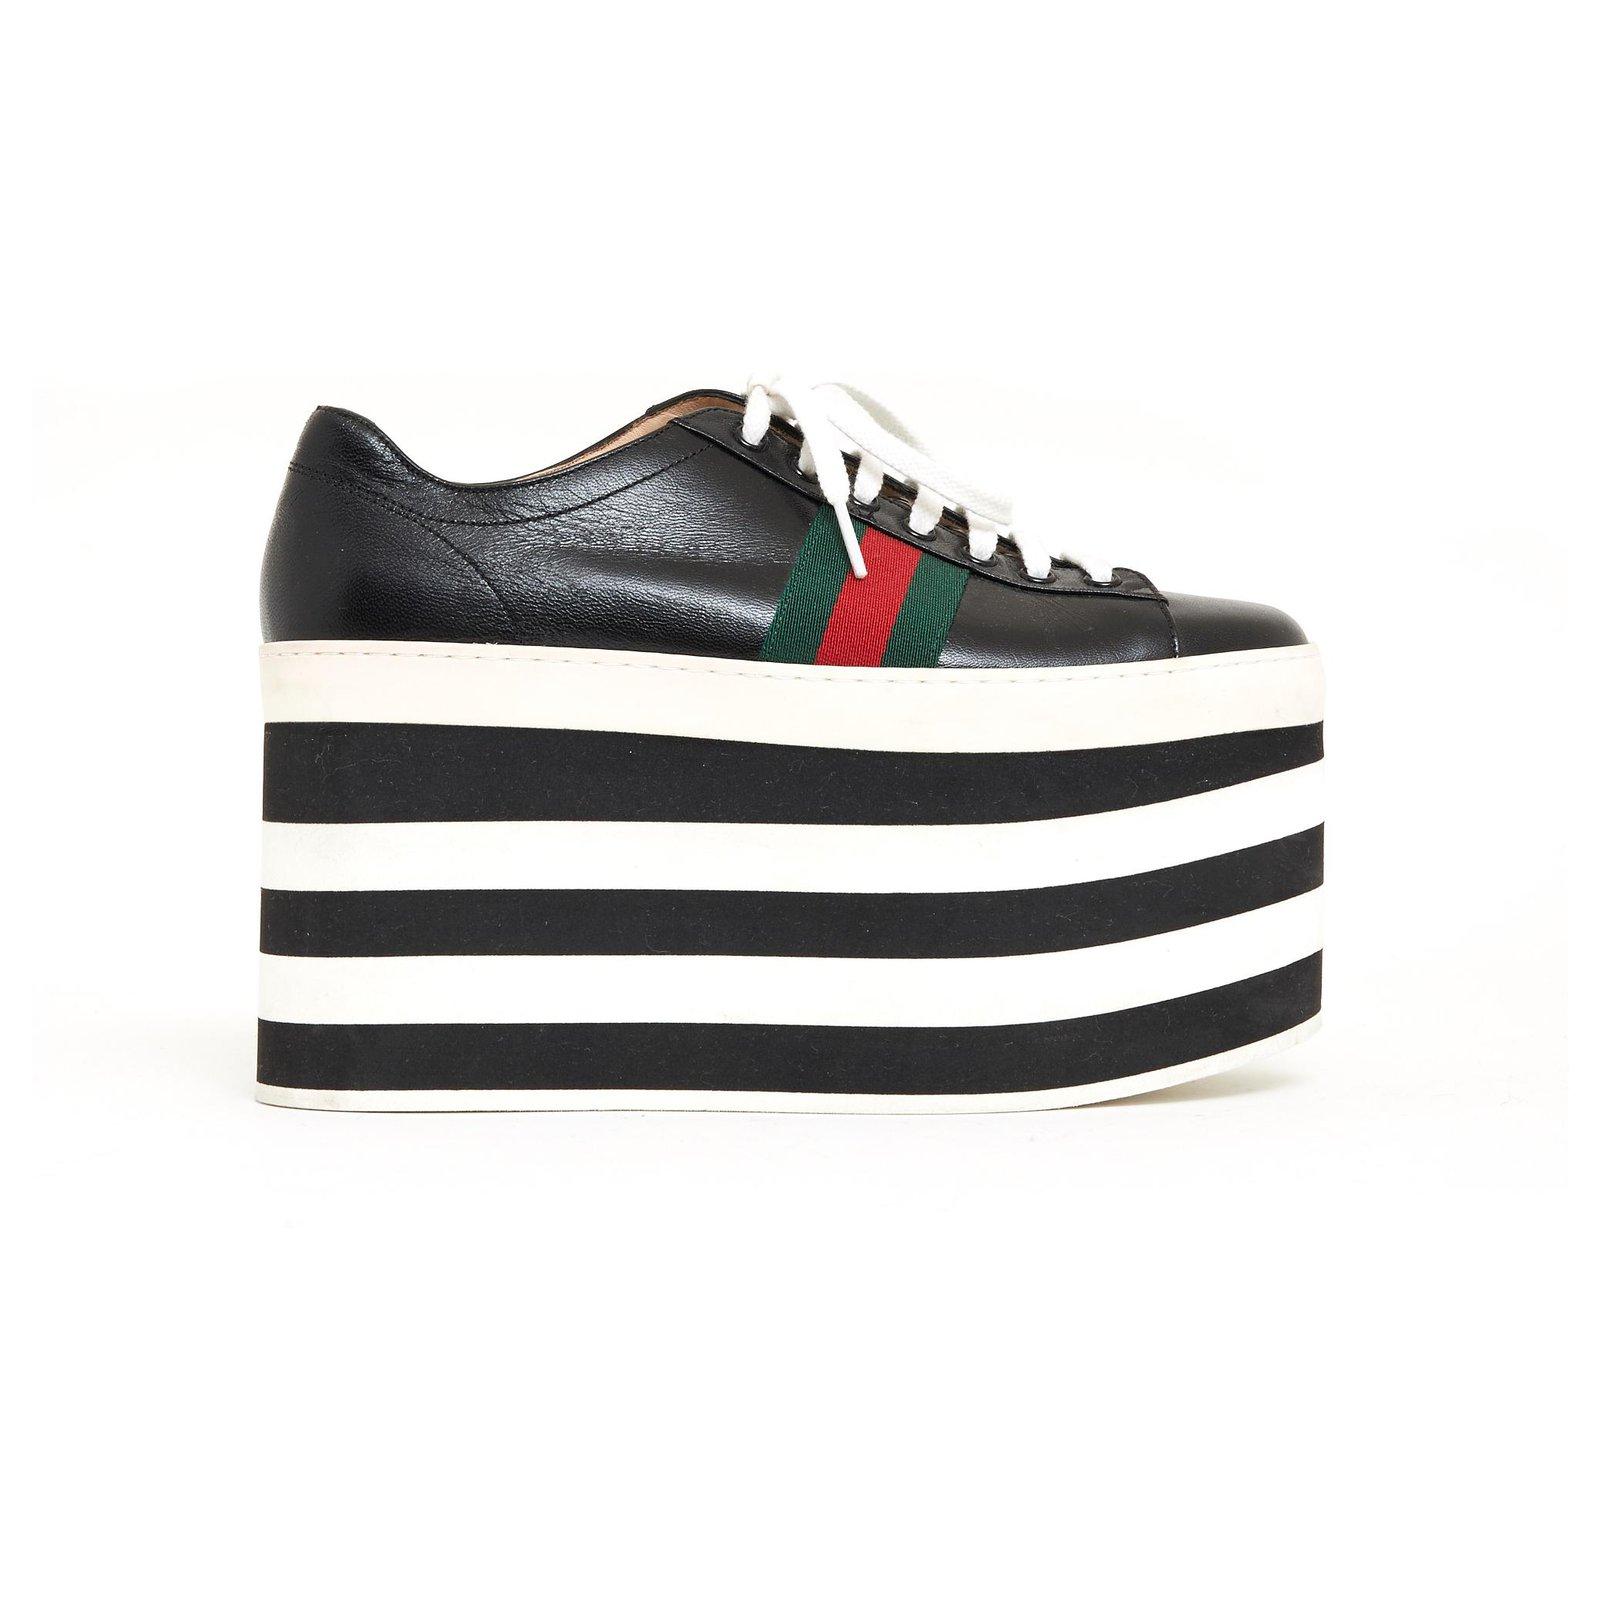 Gucci BLACK PEGGY ACE EU38.5 Sneakers